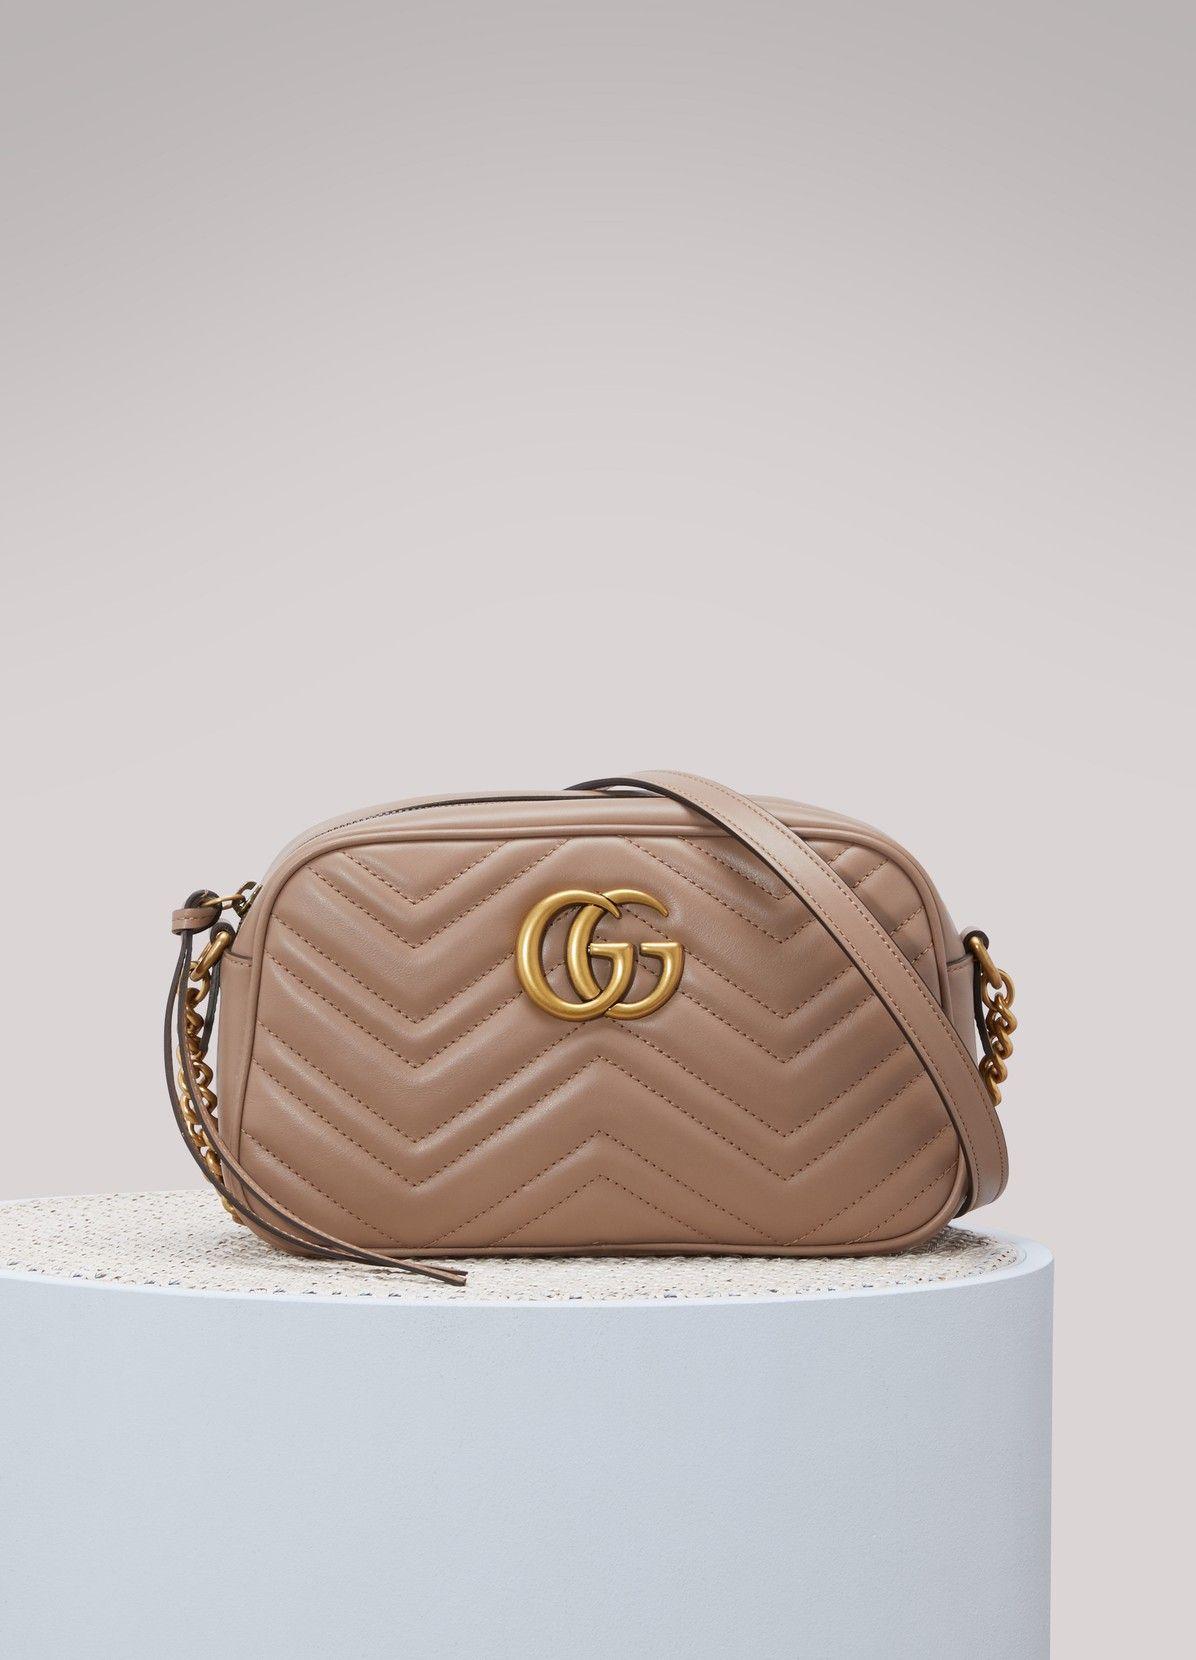 b2d1264c0fefcd GUCCI GG Marmont matelassé shoulder bag | Bags | Bags, Shoulder bag ...